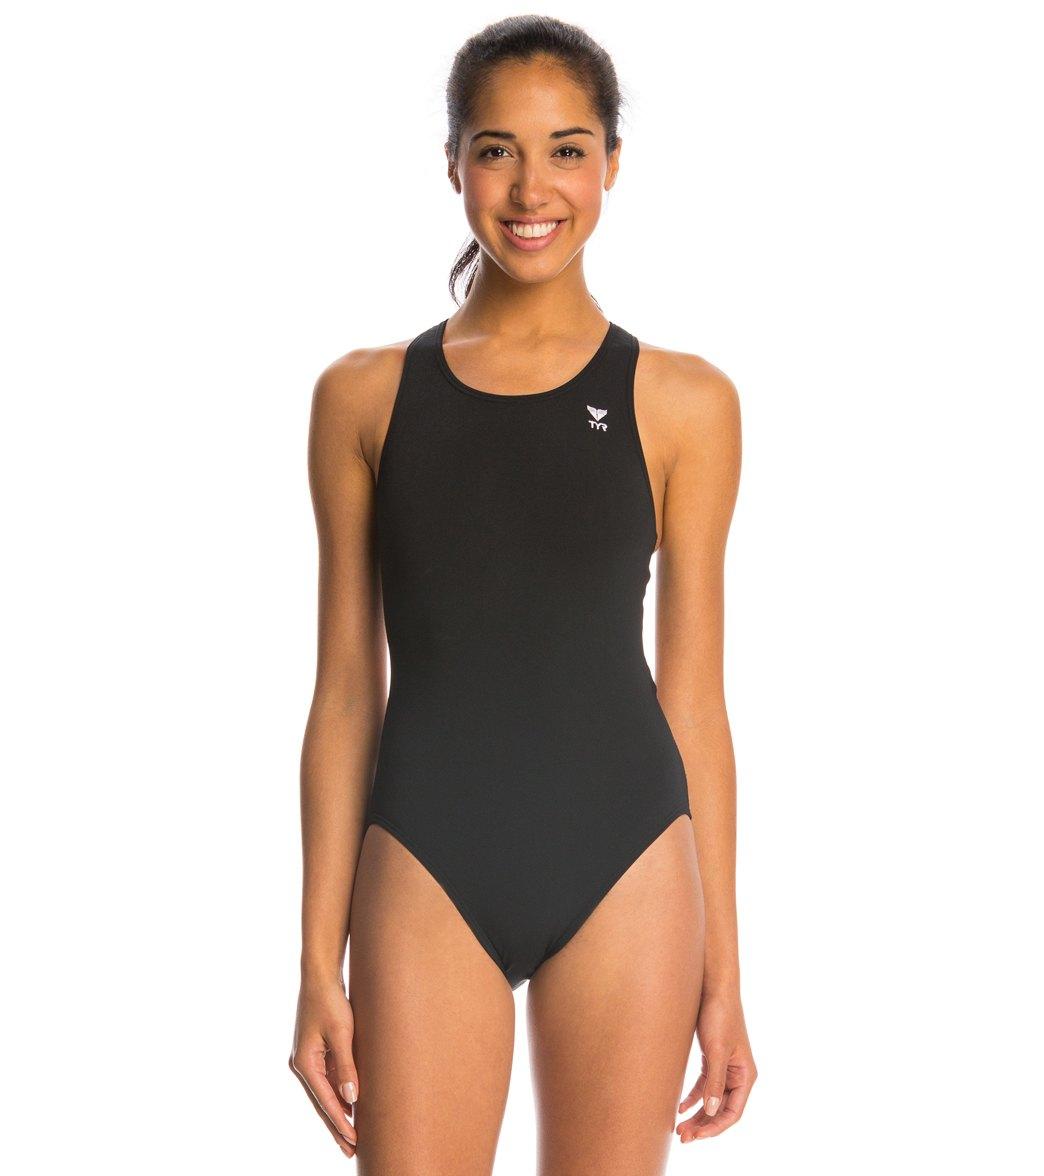 TYR Durafast Solid Maxfit One Piece Swimsuit